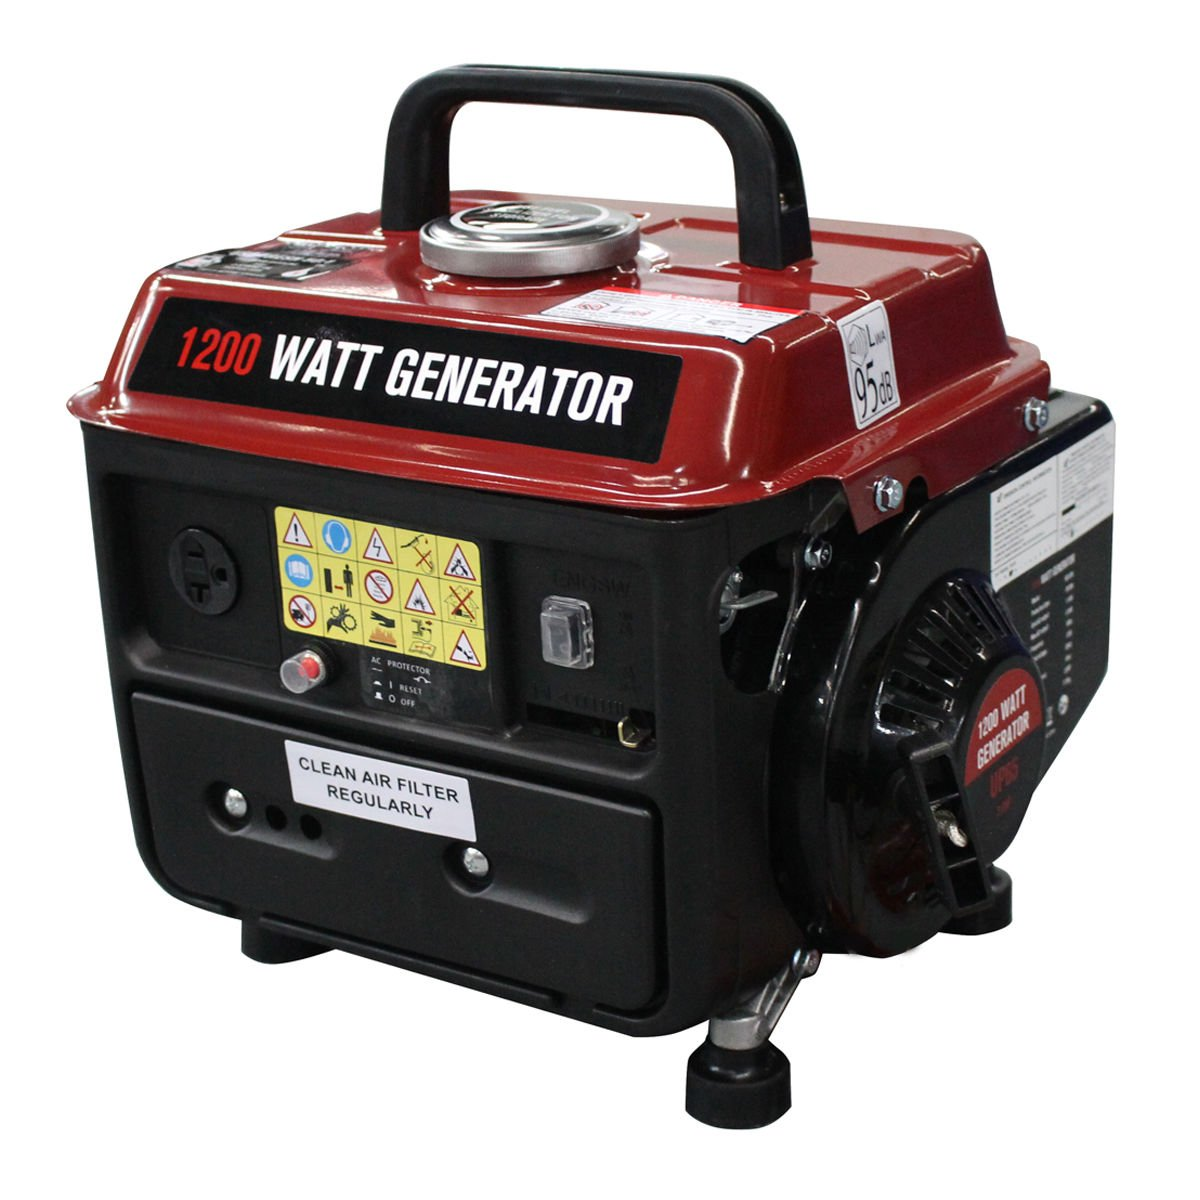 Goplus 1200 Watt Gasoline Portable Generator Gas Powered 2 Stroke 63cc Single Cylinder W/ Air Cooling System EPA Approved by Goplus